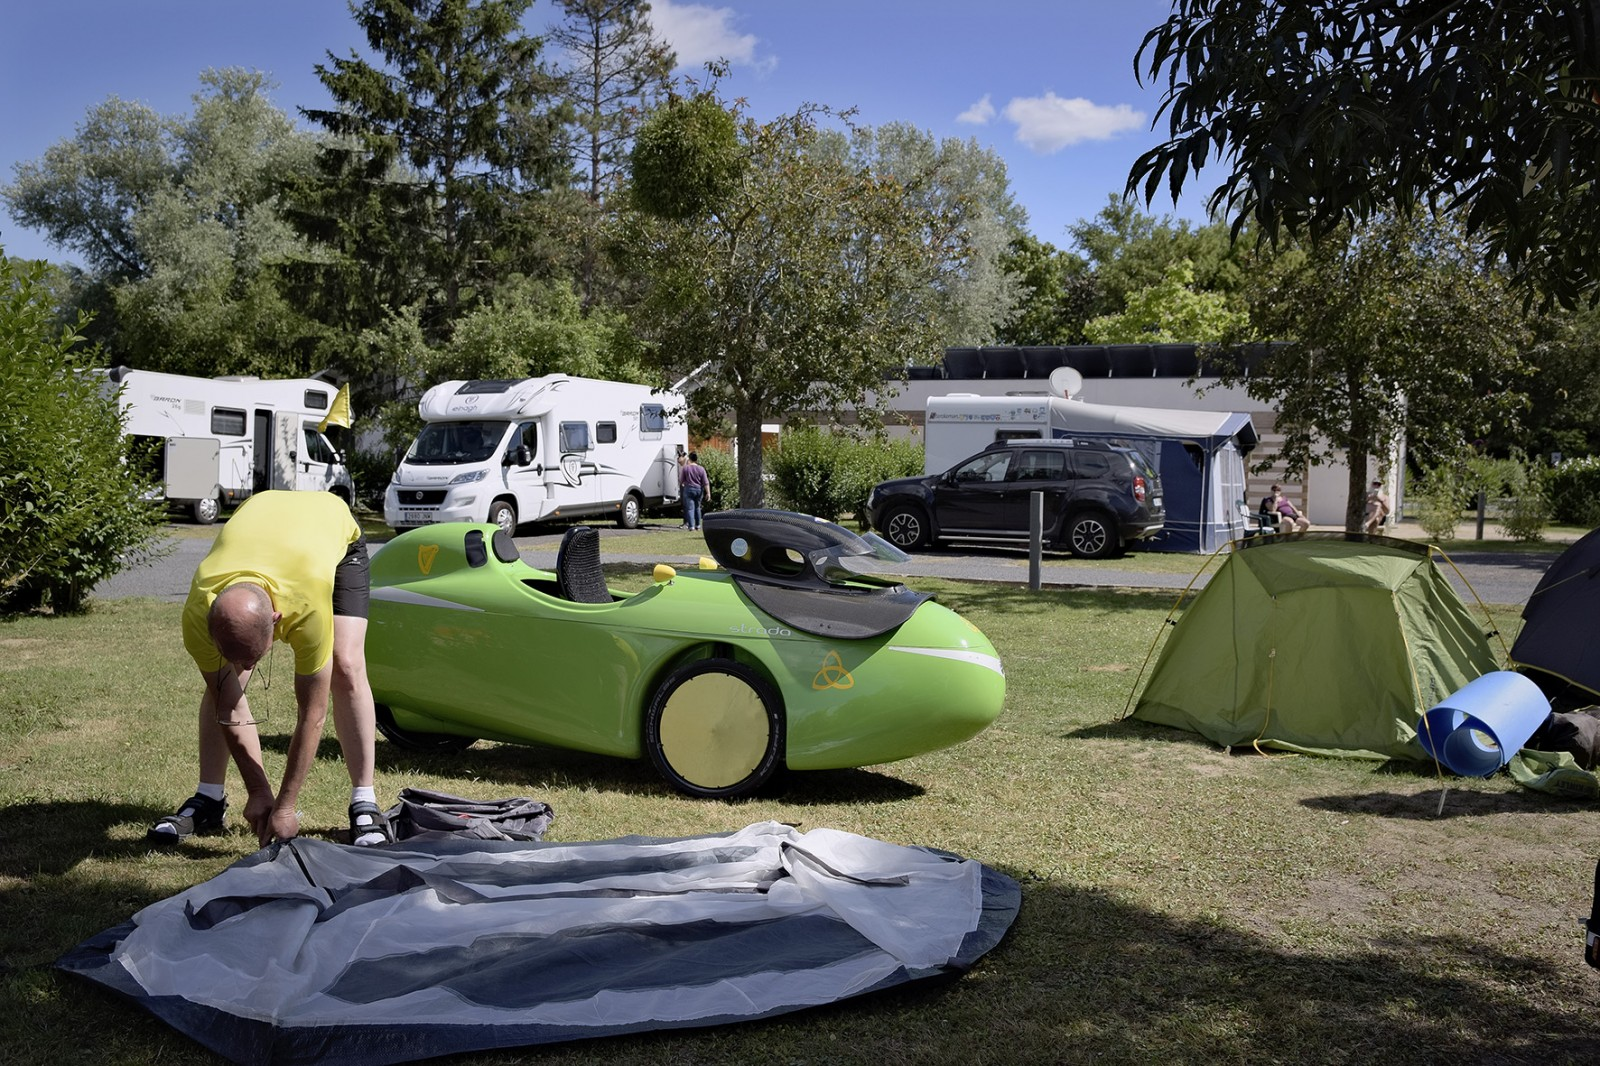 Camping St avertin